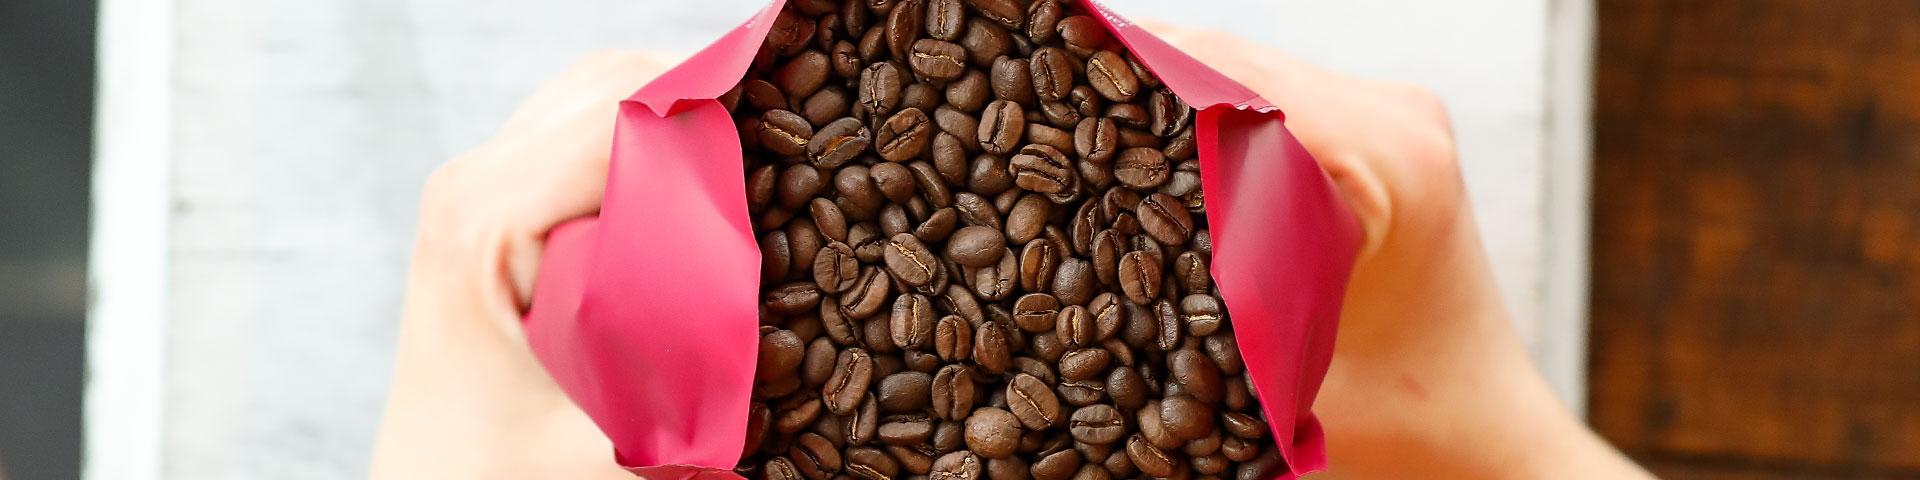 Espresso Sorten - Alle DINZLER Espresso Sorten